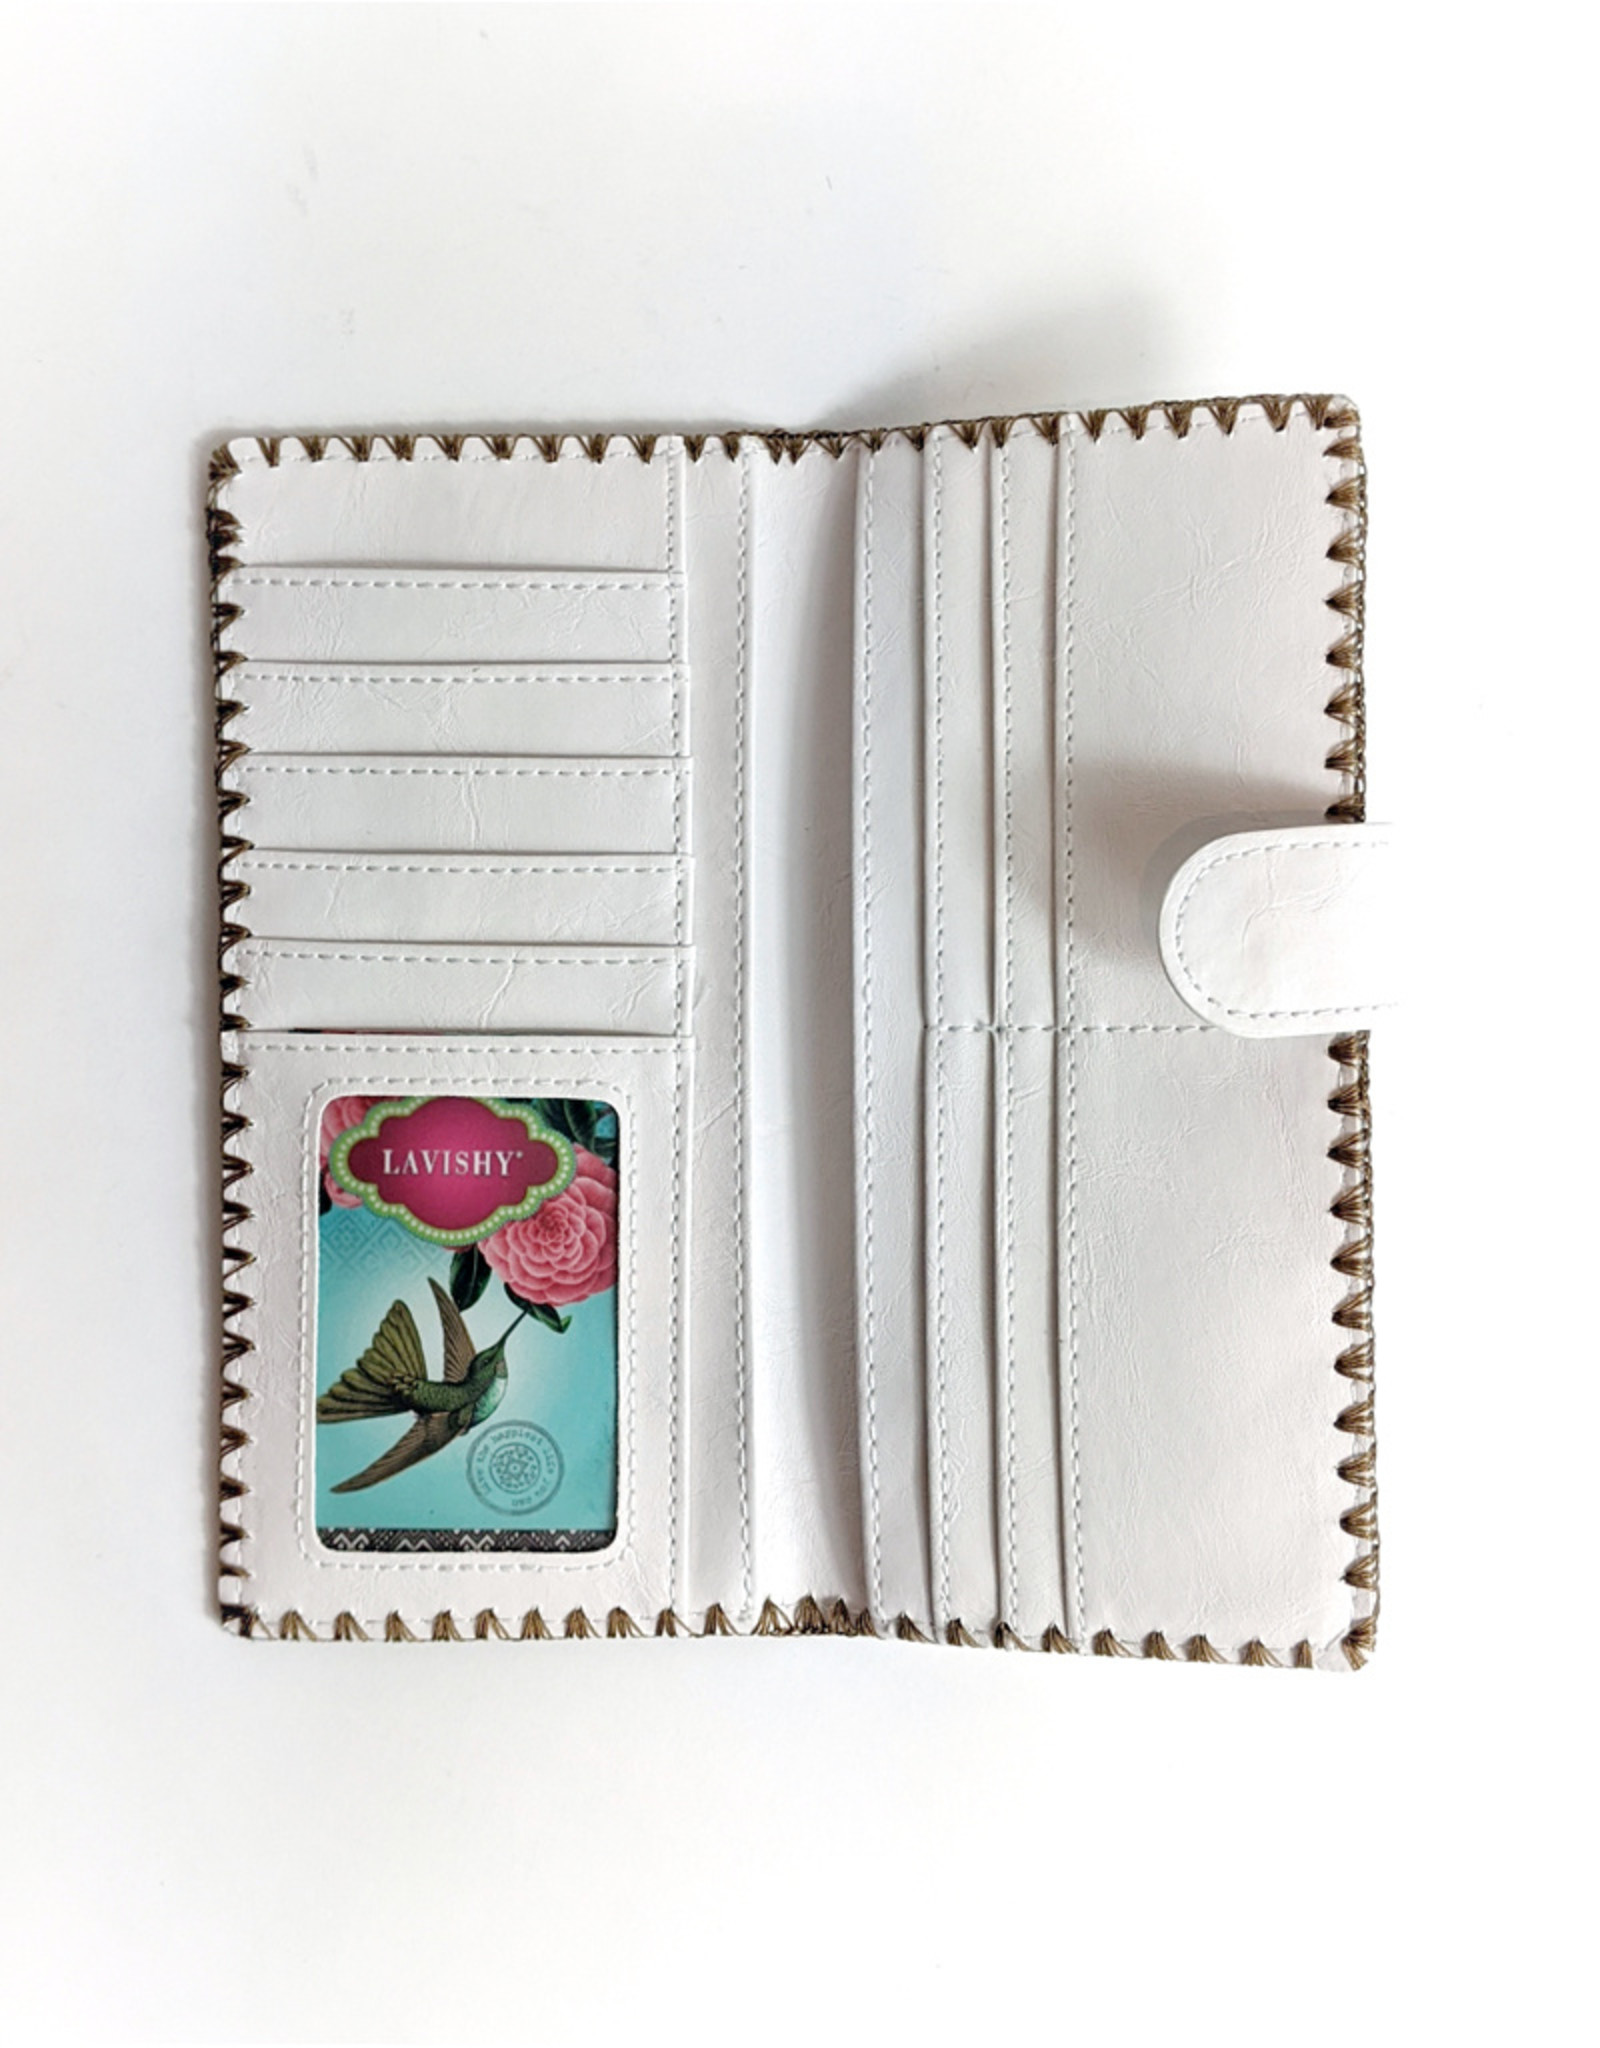 Lavishy Lavishy Embroidered Wallet